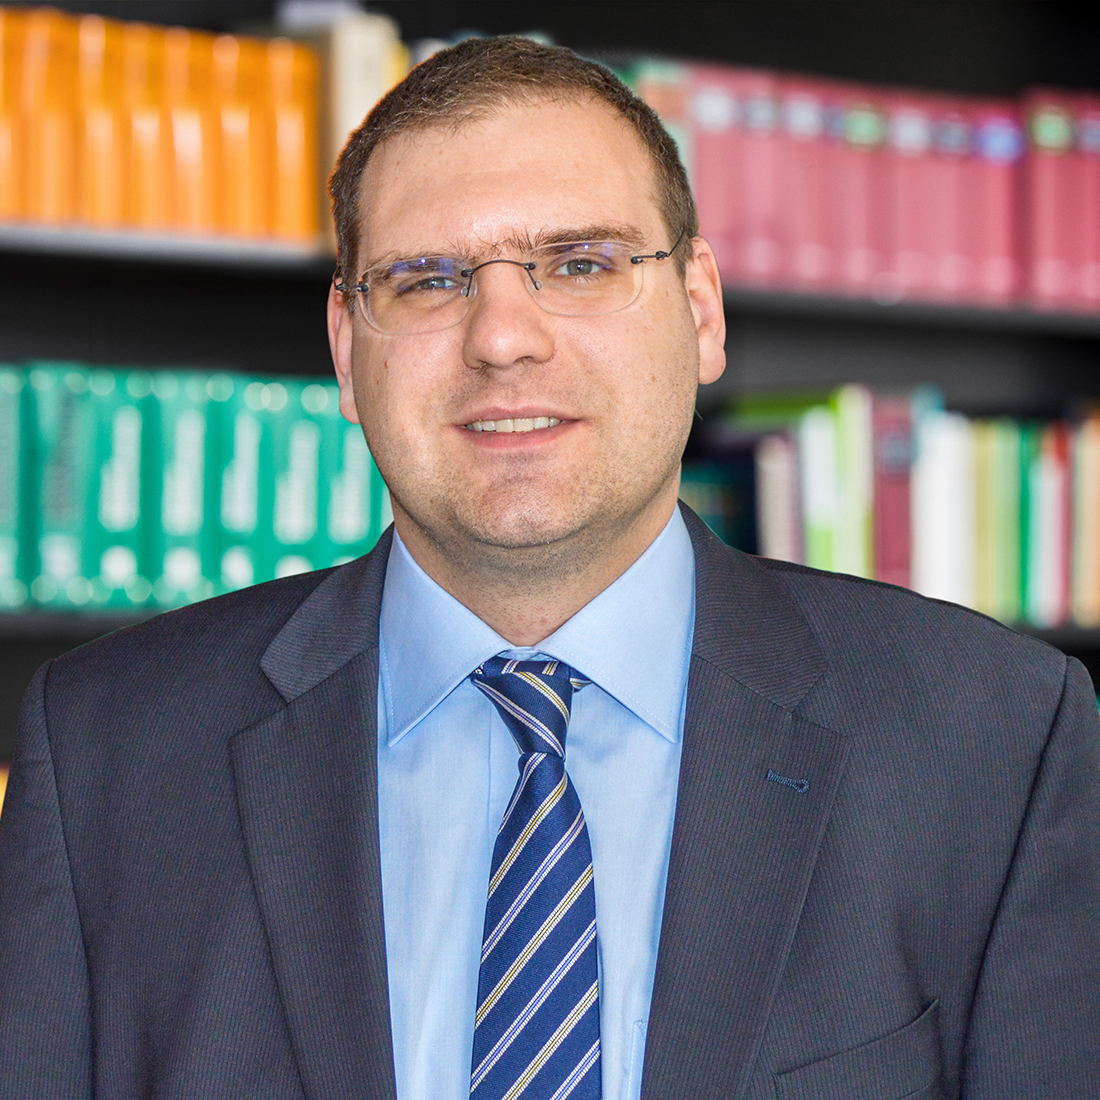 Justus Alexander Jentzsch